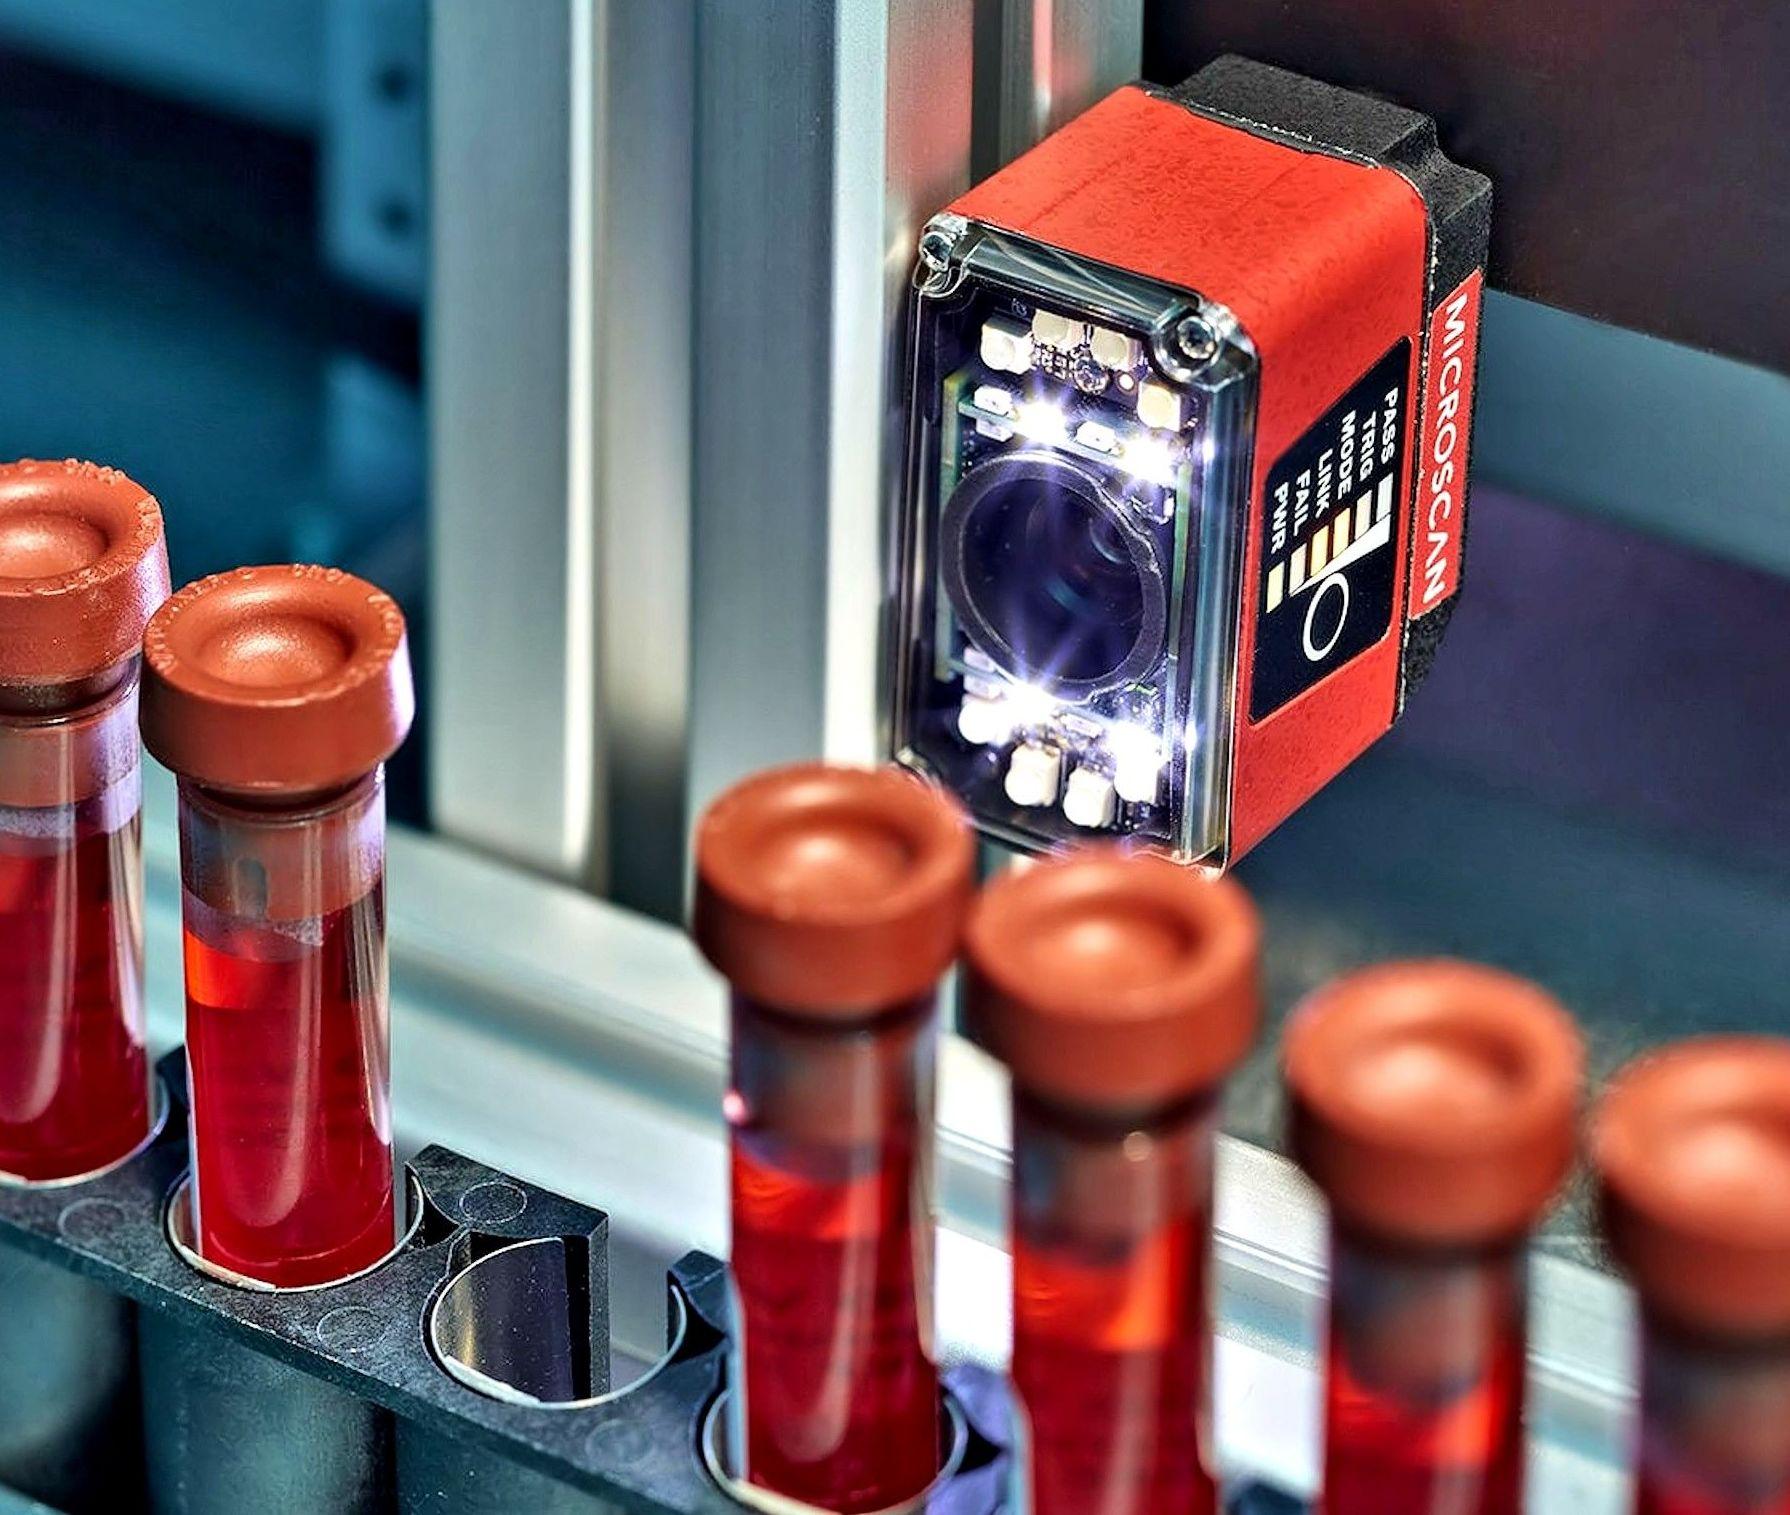 Automatic Data Capture Laser and Cameras: Productos y Servicios de  S T G L O B A L